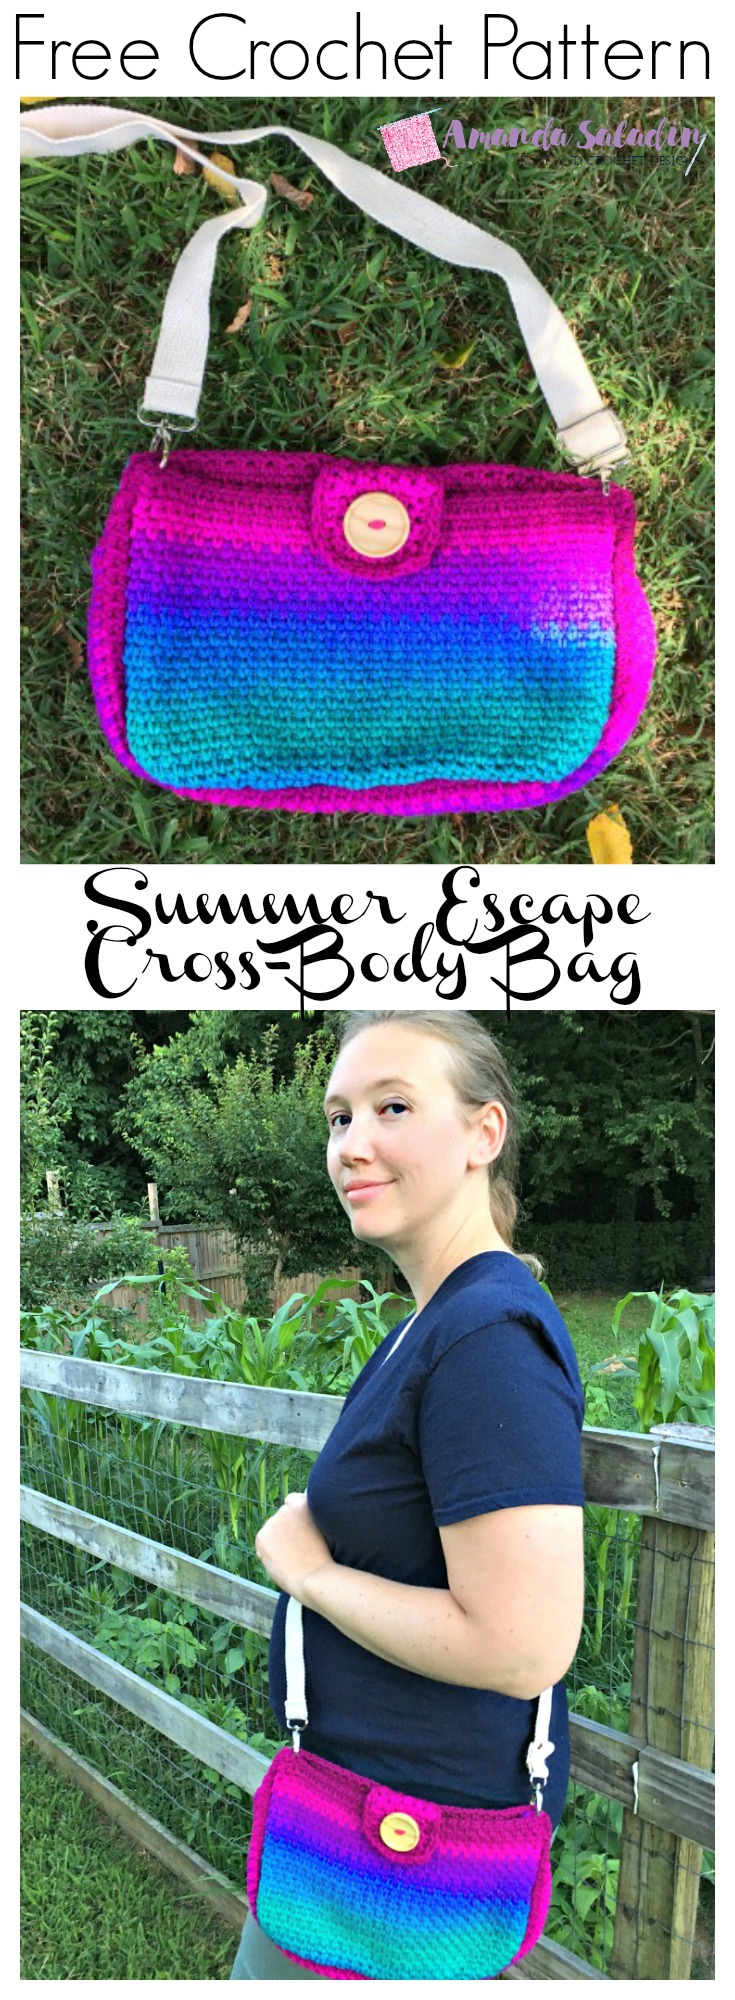 Free Crochet Pattern - Summer Escape Cross-Body Bag by Amanda Saladin